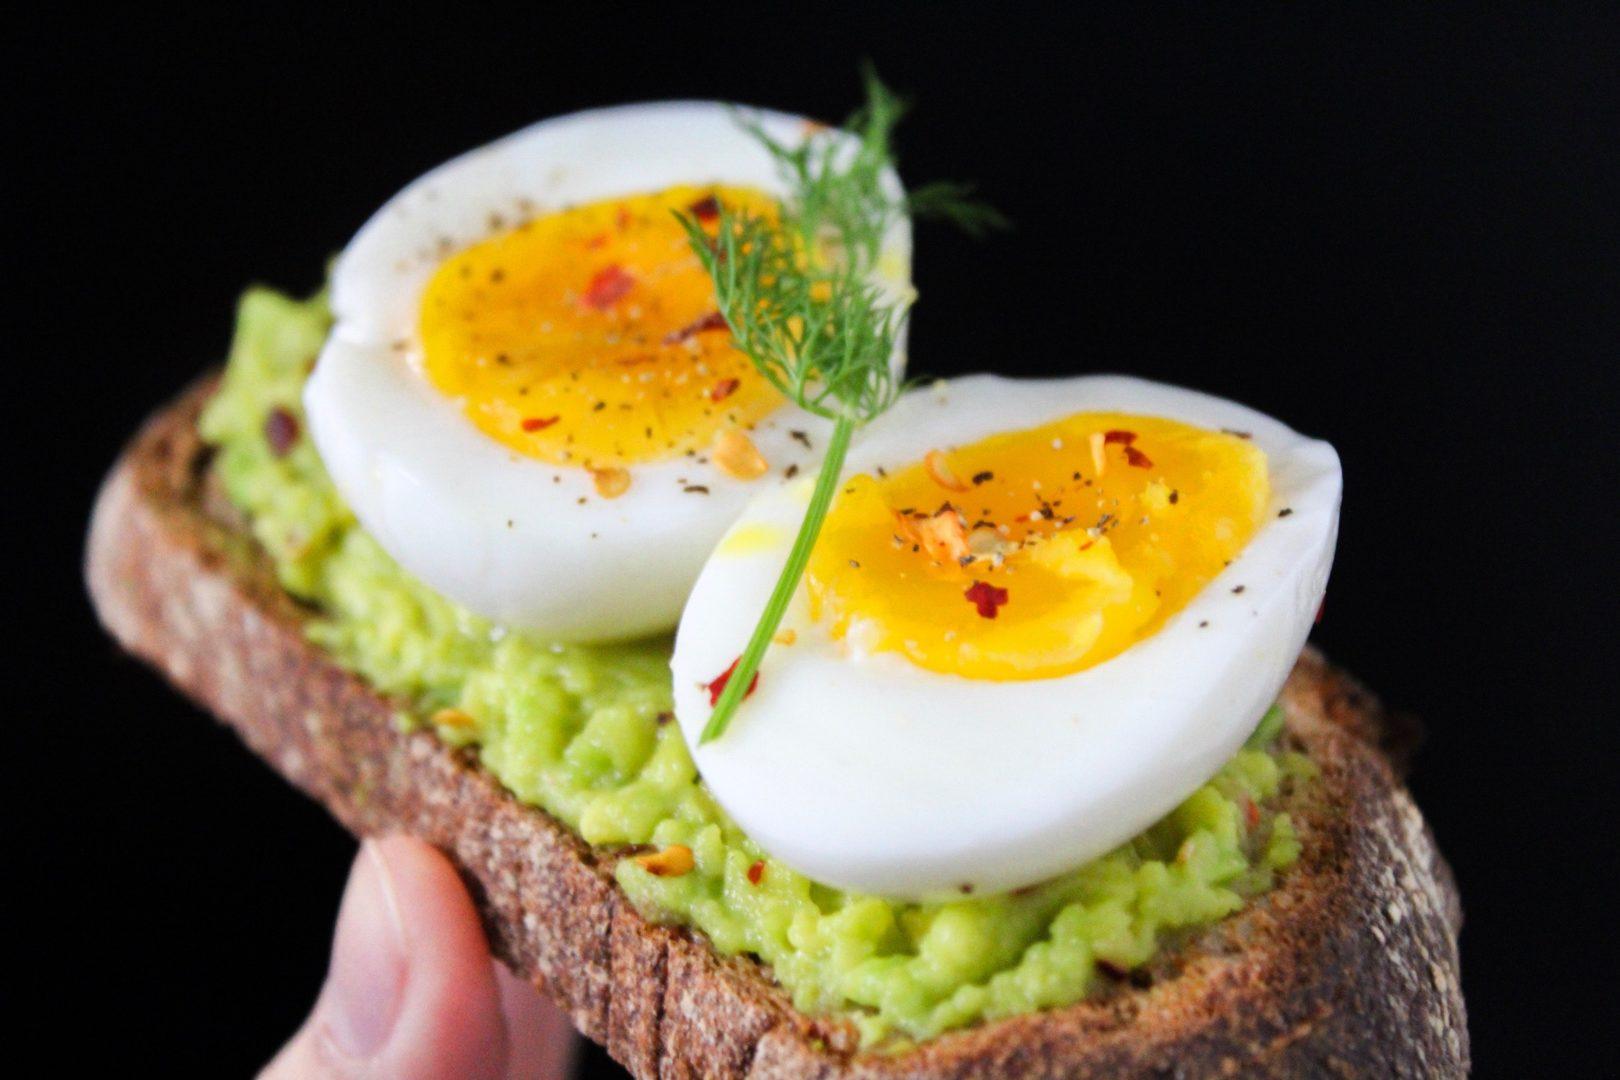 Breakfast recipe: Avocado toast with boiled egg